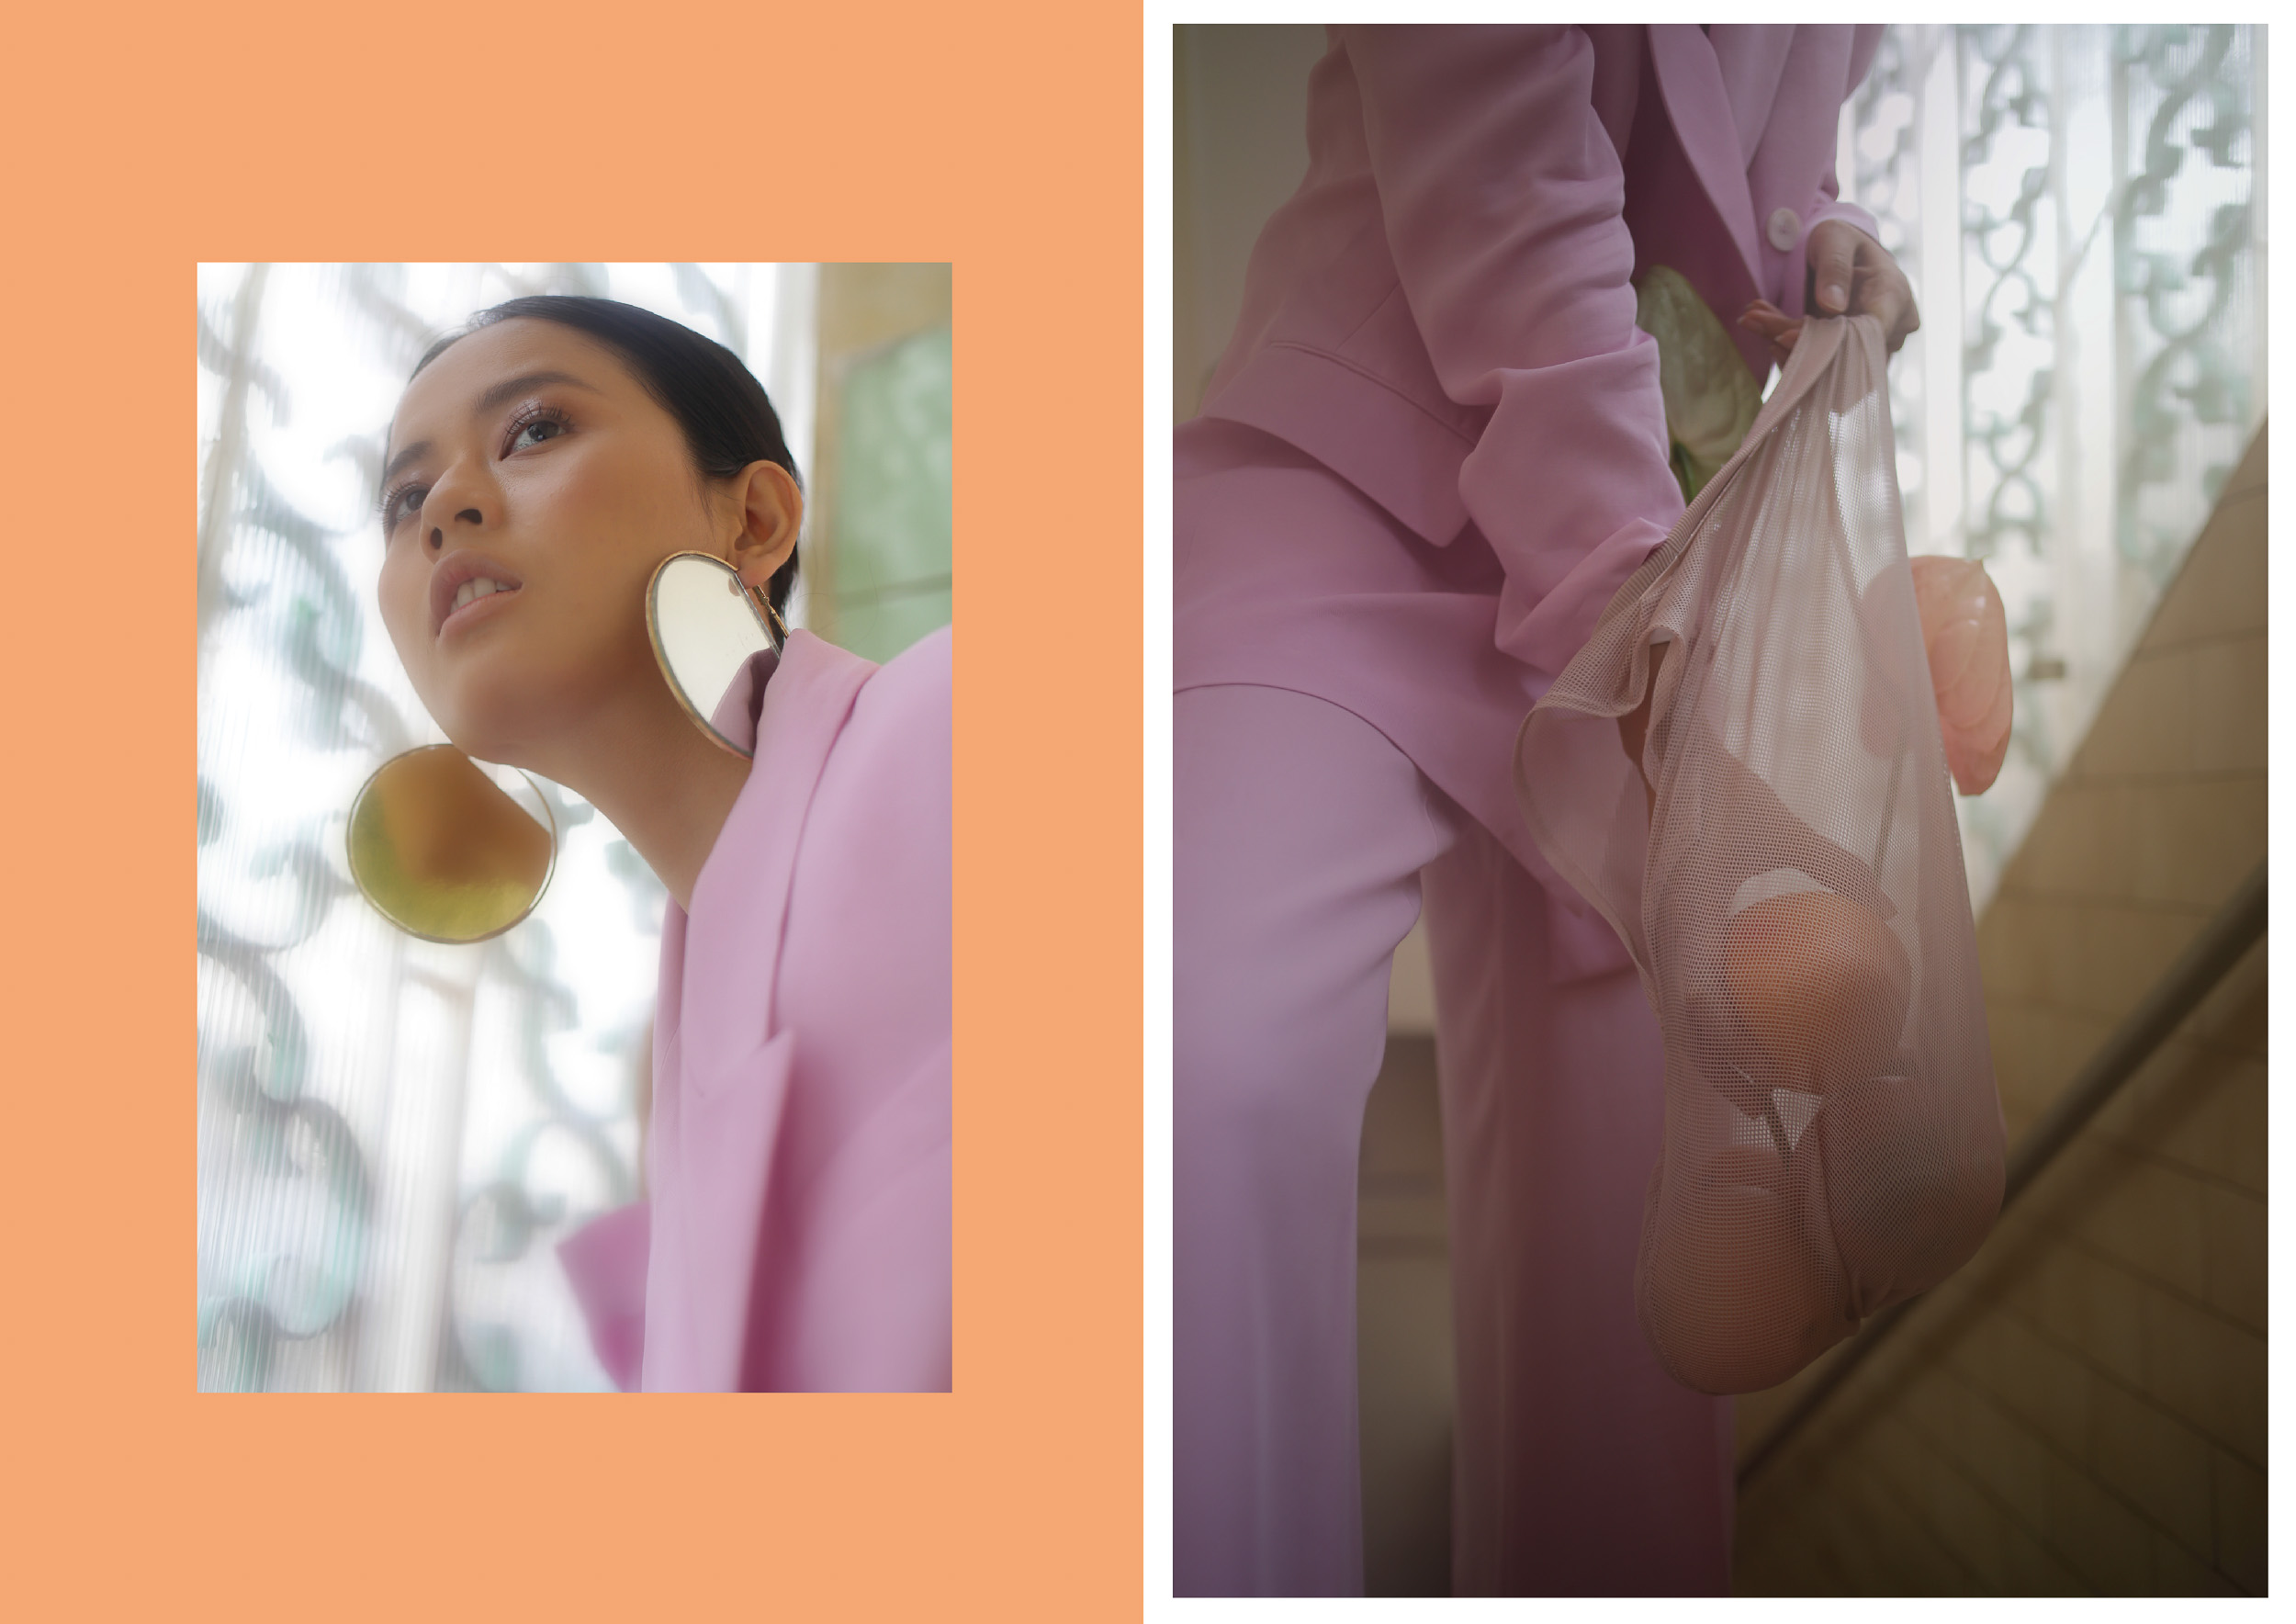 Sindhur_Photography_Fashion_StopTheExcuses-1.JPG